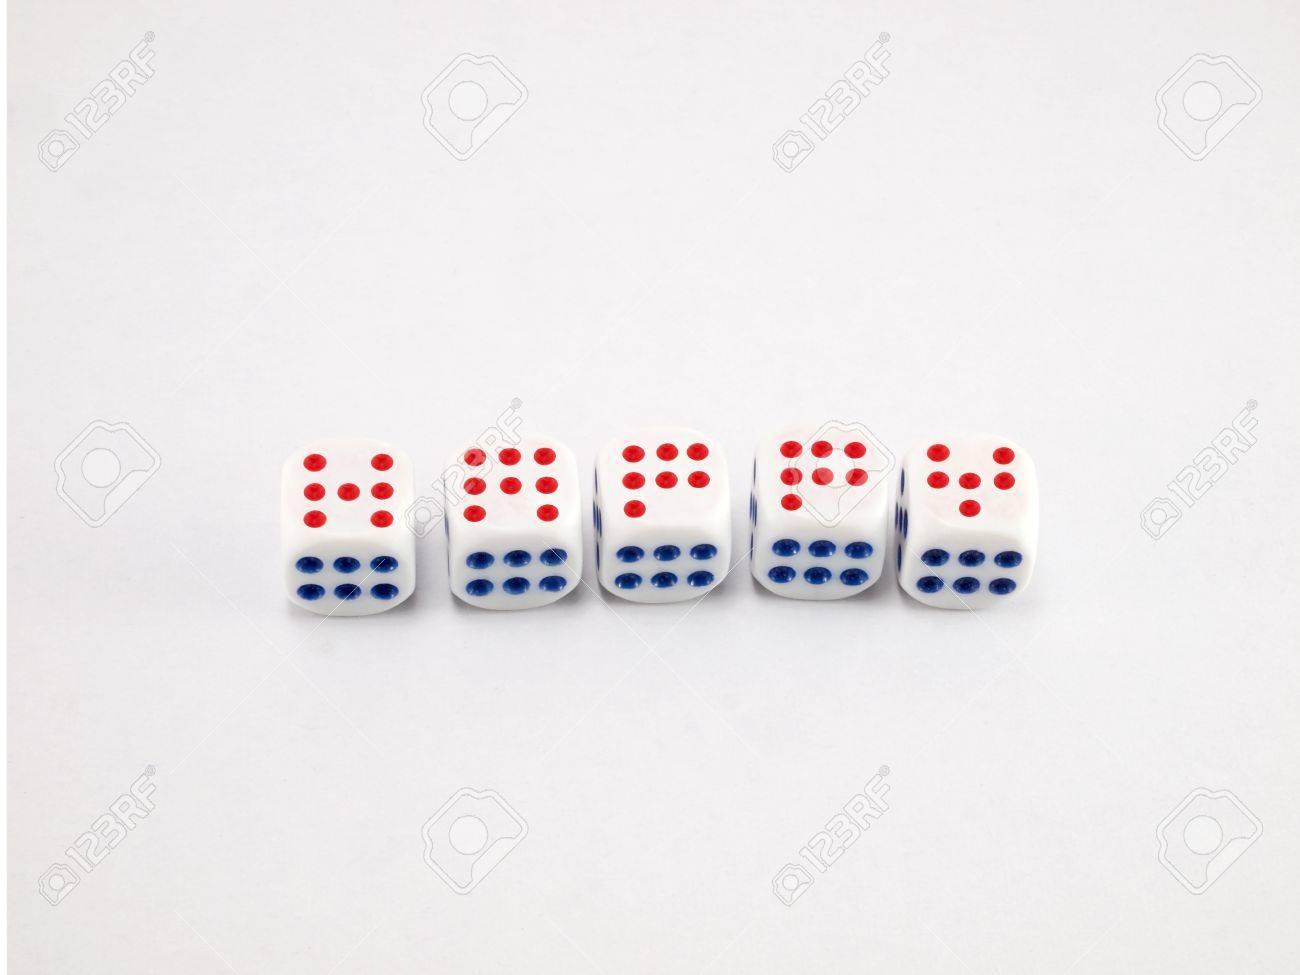 Happy that we build on the dice Stock Photo - 10659475